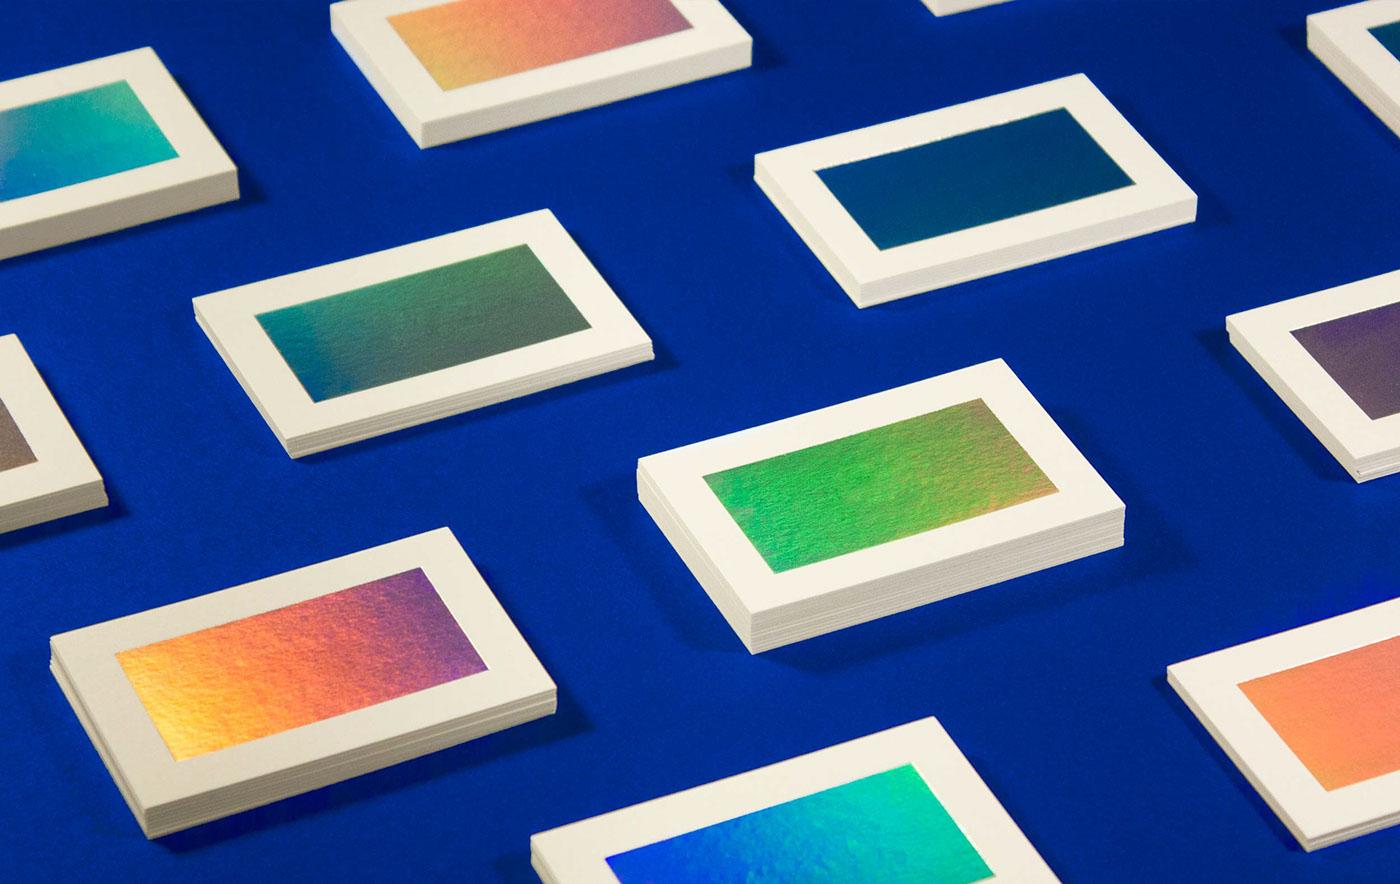 gradient holographic foil debossing Business Cards paper billboard paper